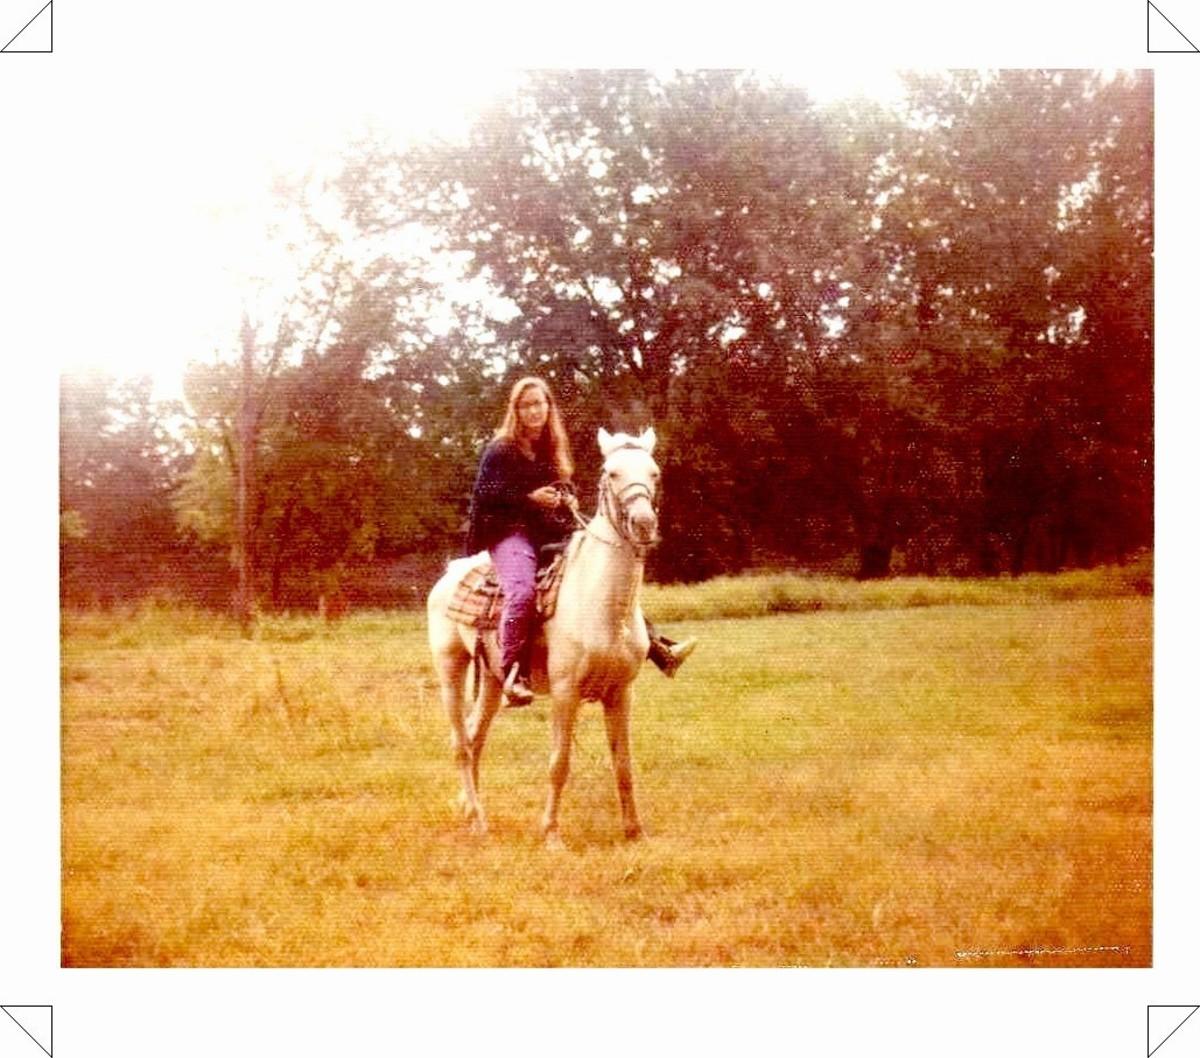 Bob's horse Razz